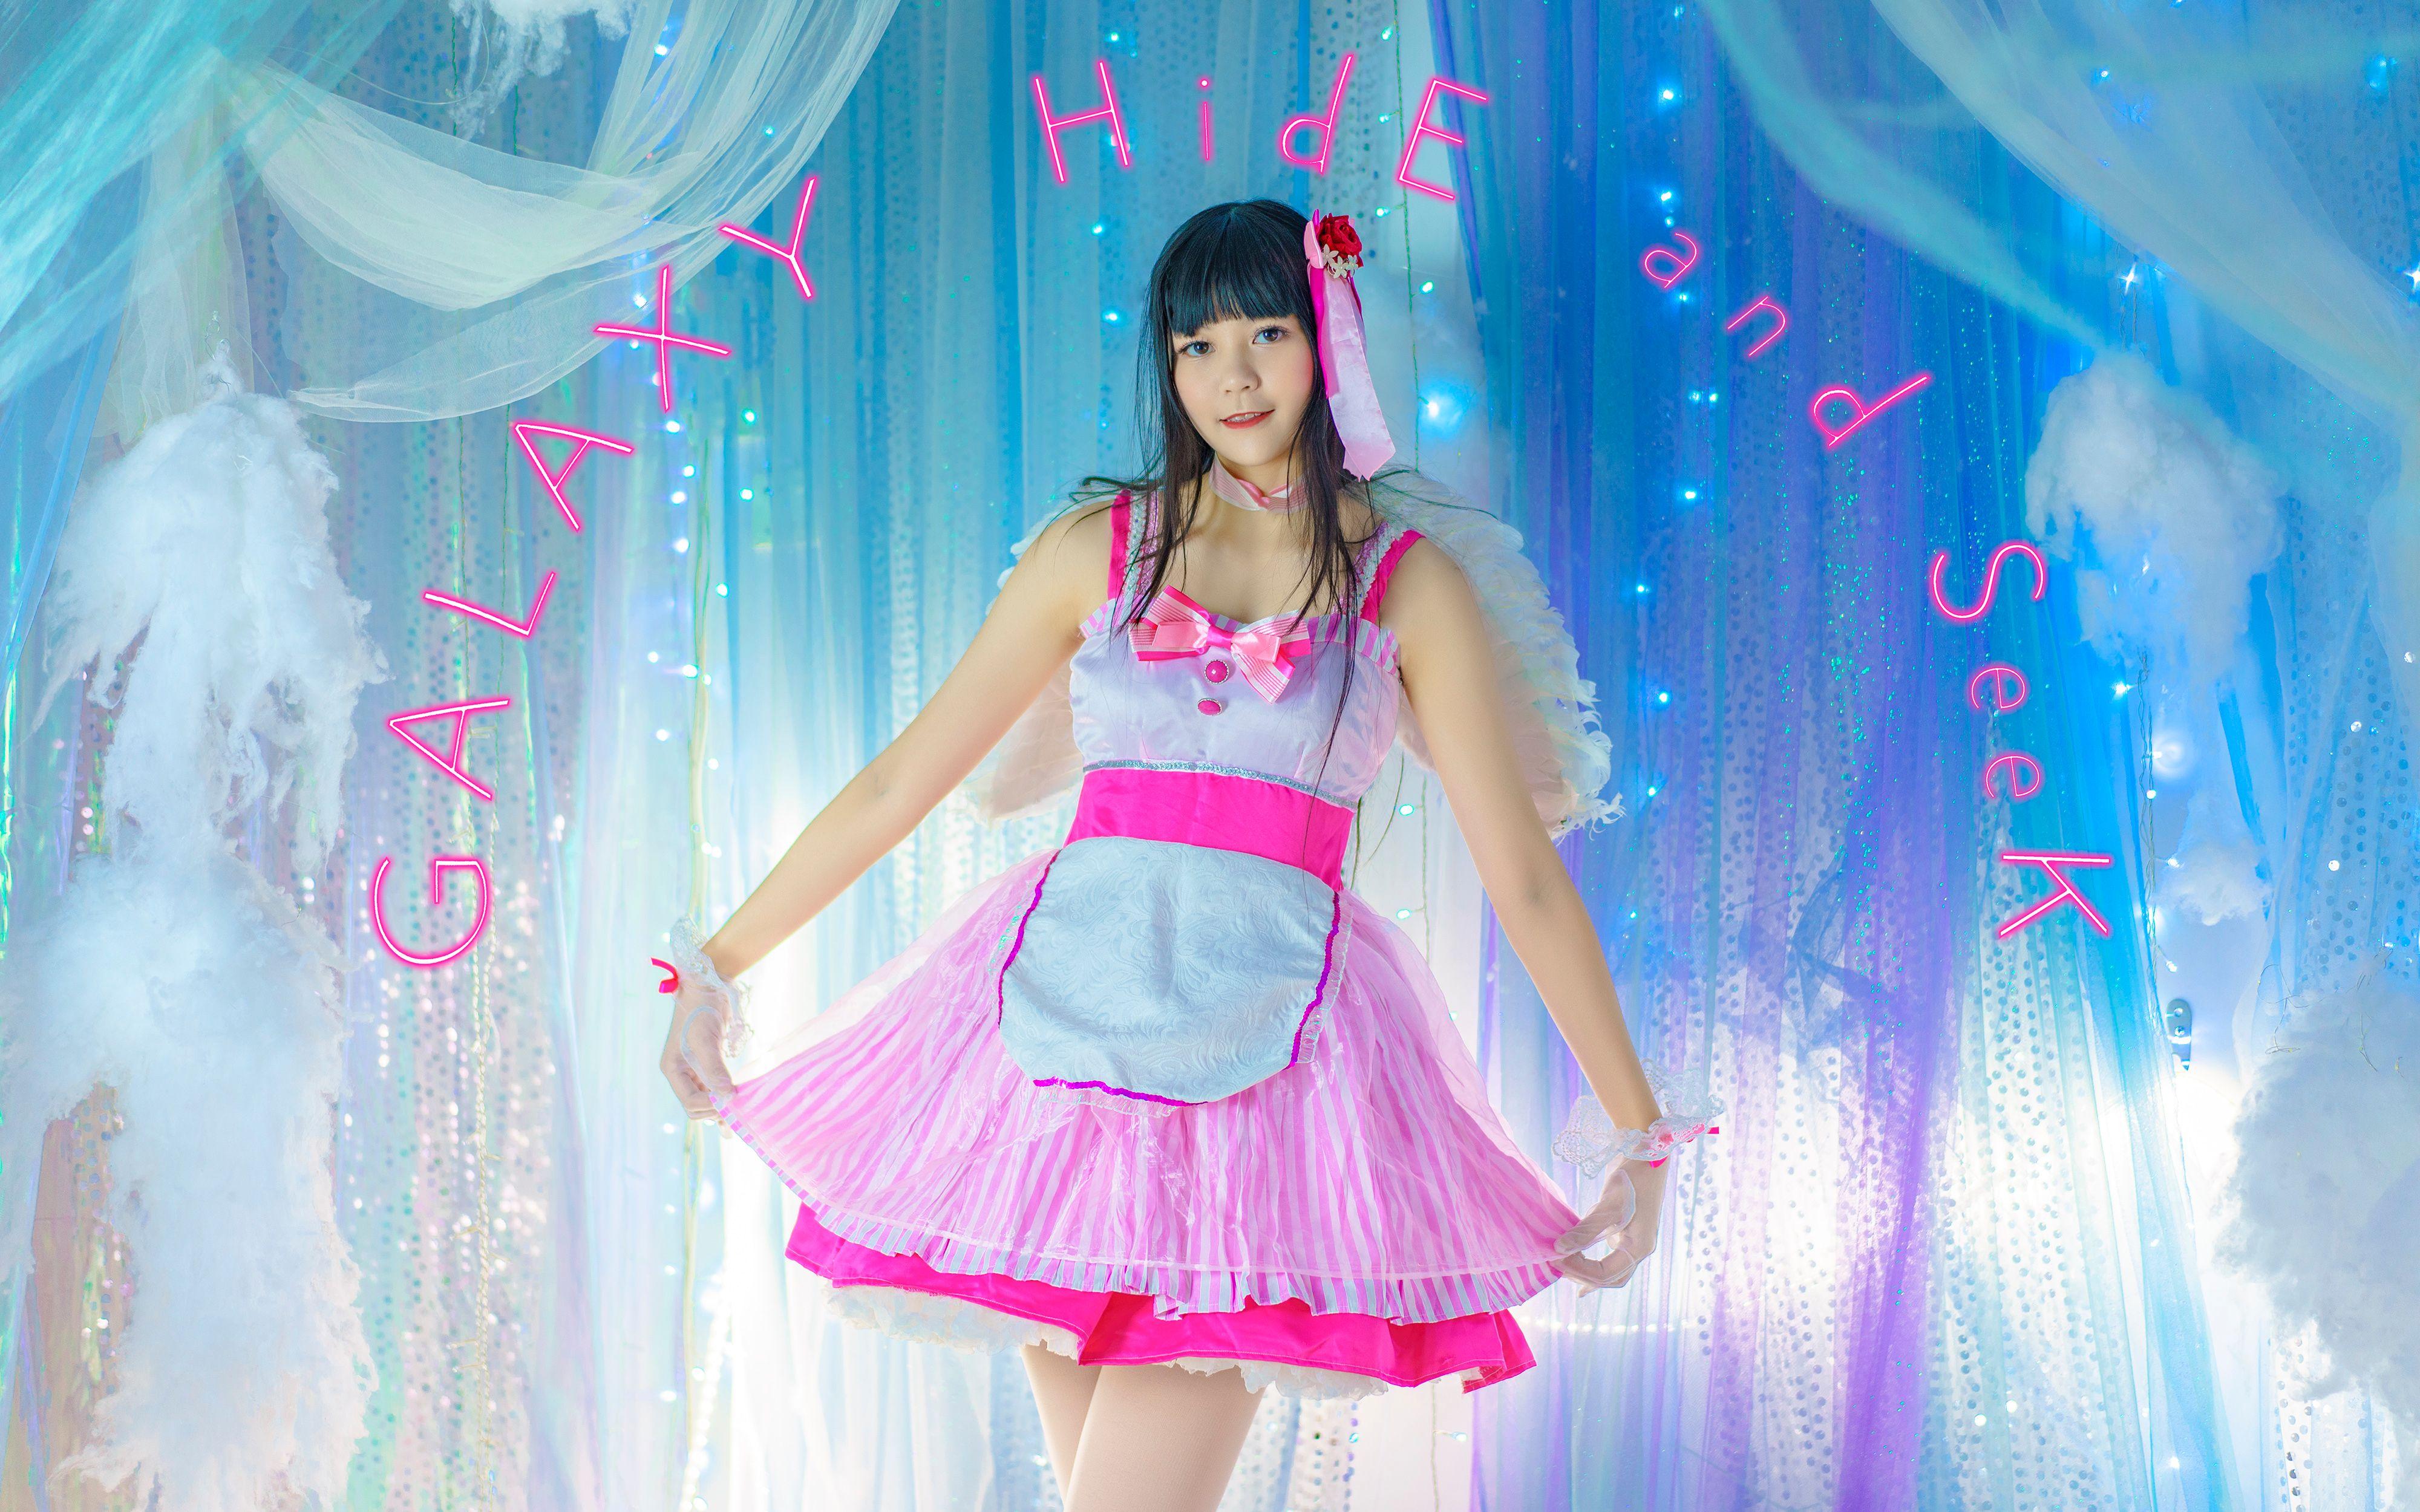 【CK】GALAXY HidE and SeeK❤银河系躲猫猫丨AZALEA小组2nd衣装黑泽黛雅(还是小宫有纱?)